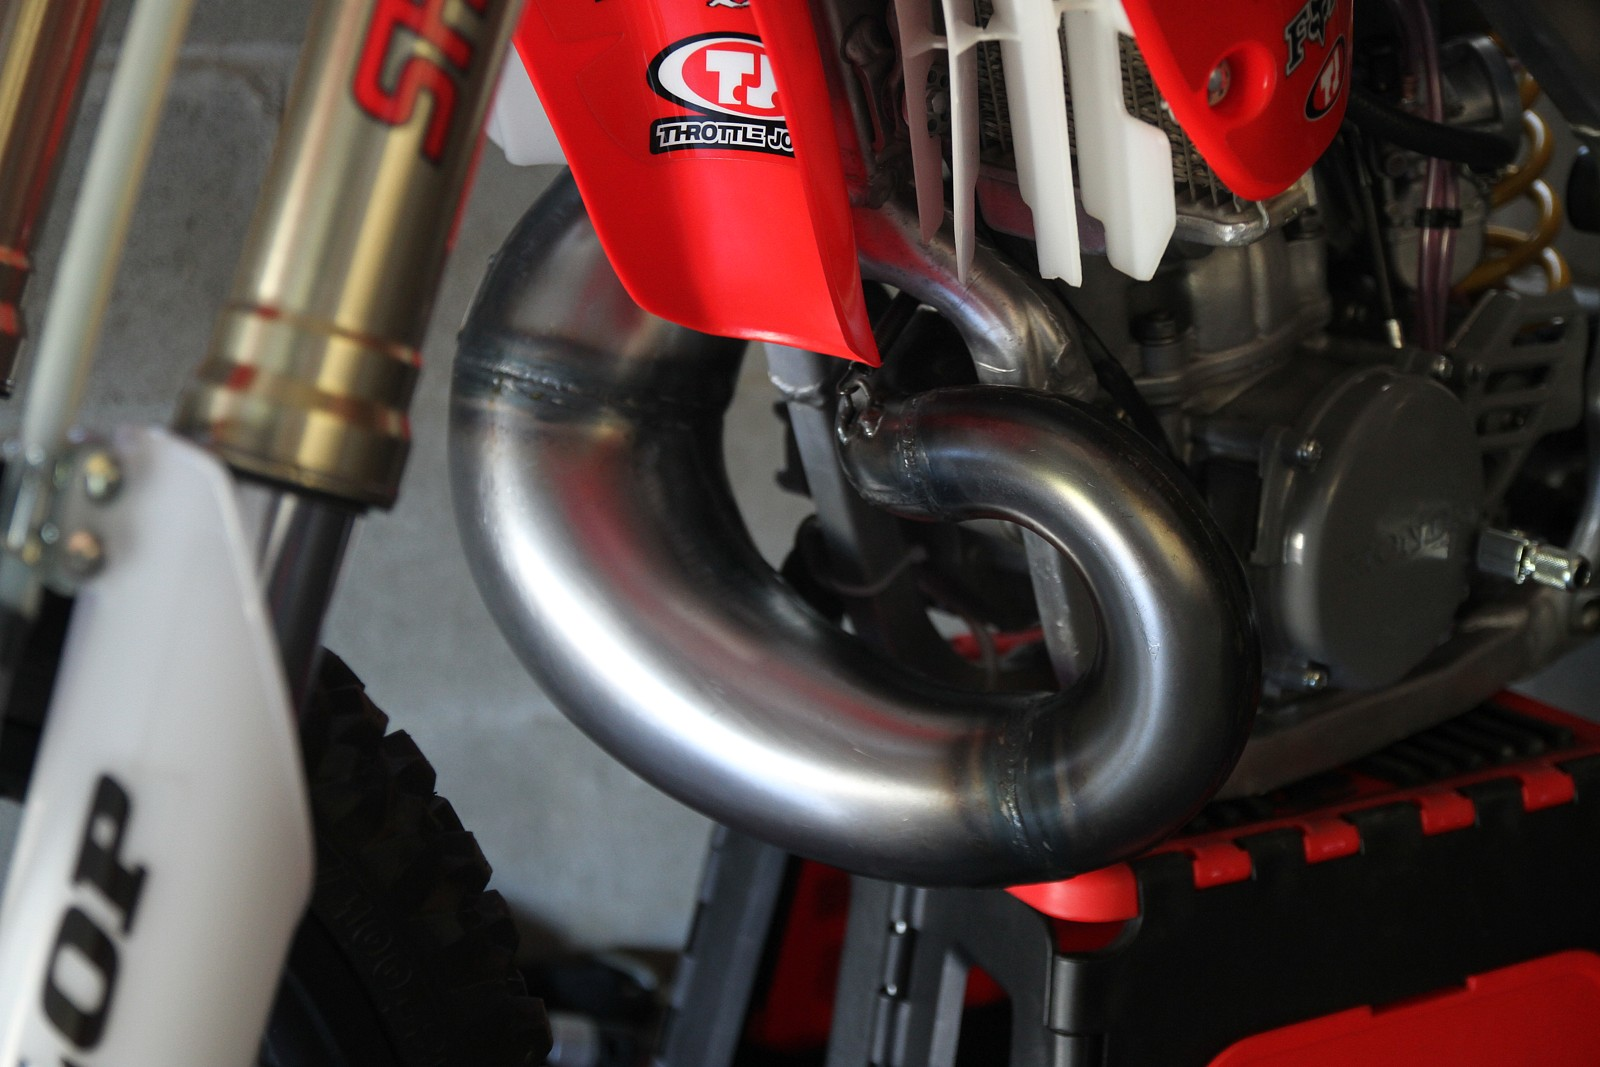 F8A05C59-7CB3-4293-B185-8FA512EA722A - Godcho - Motocross Pictures - Vital MX